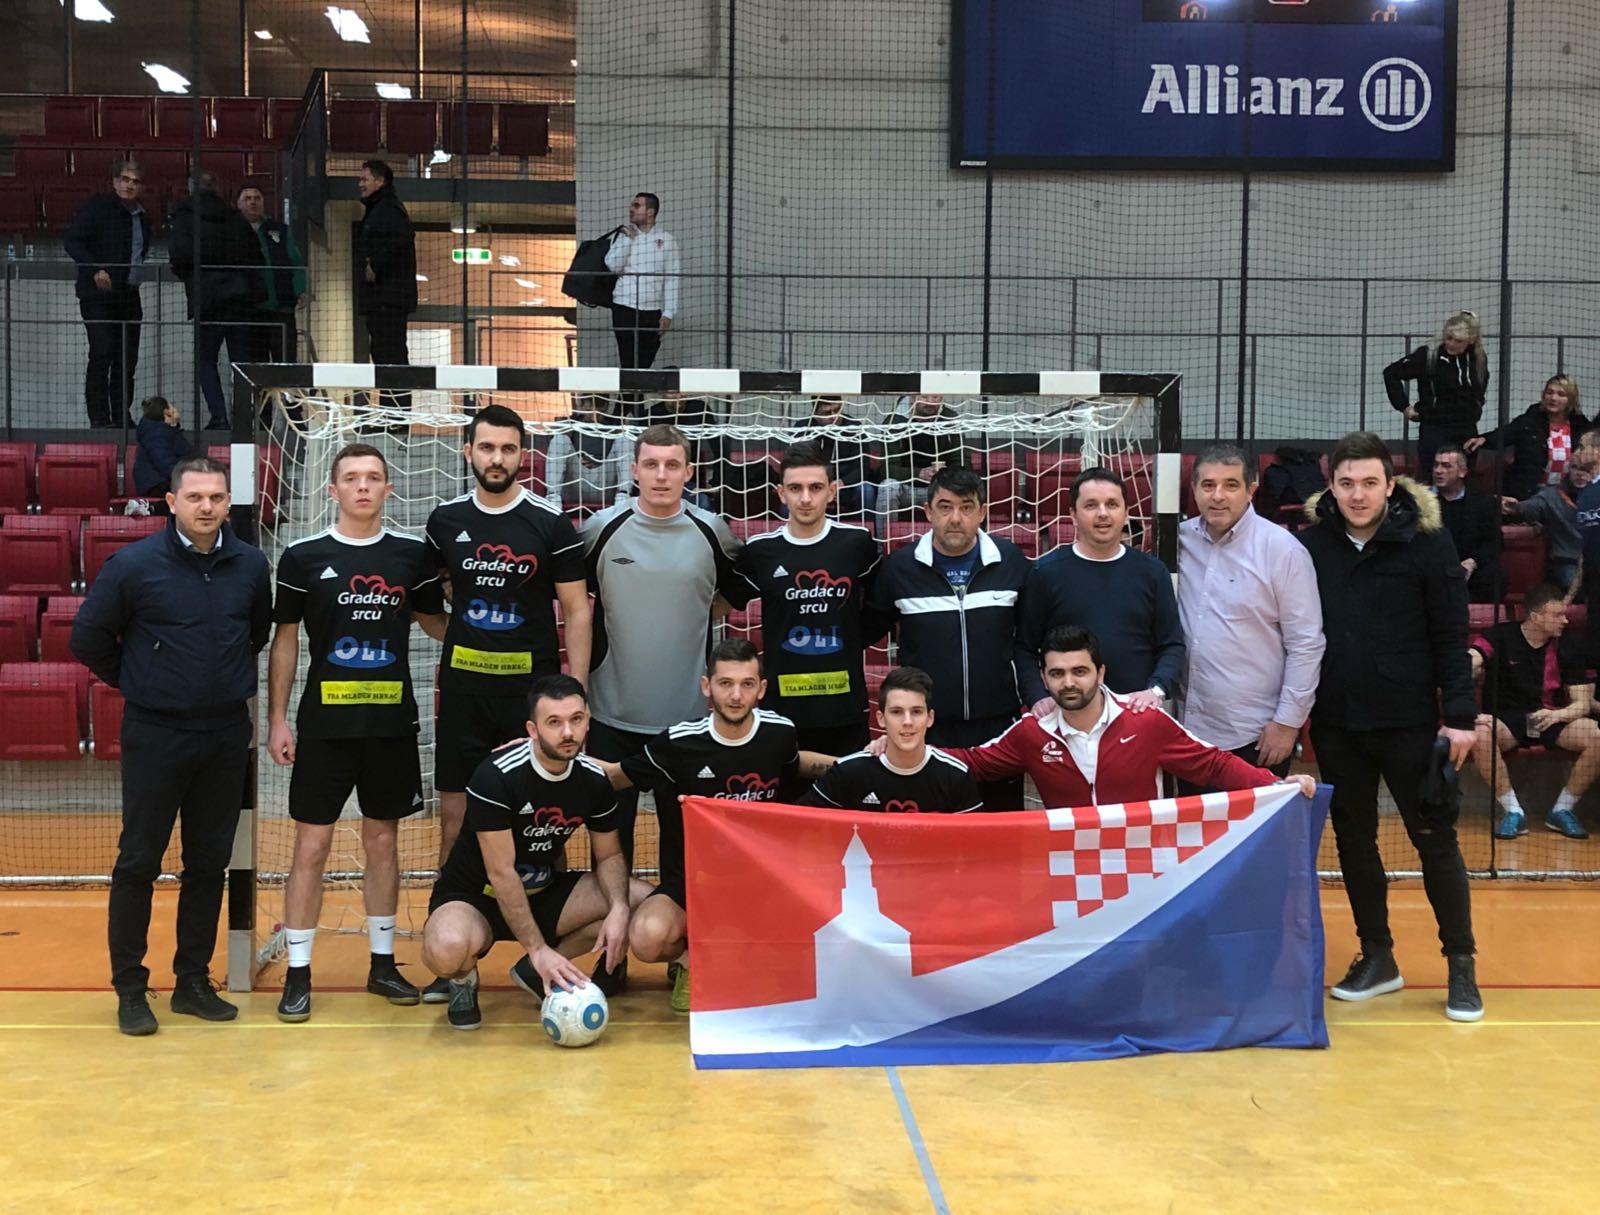 Momčad humanitarne udruge fra Mladen Hrkać na malonogometnom turniru Futsal Topas Z Cup u Stuttgart-u